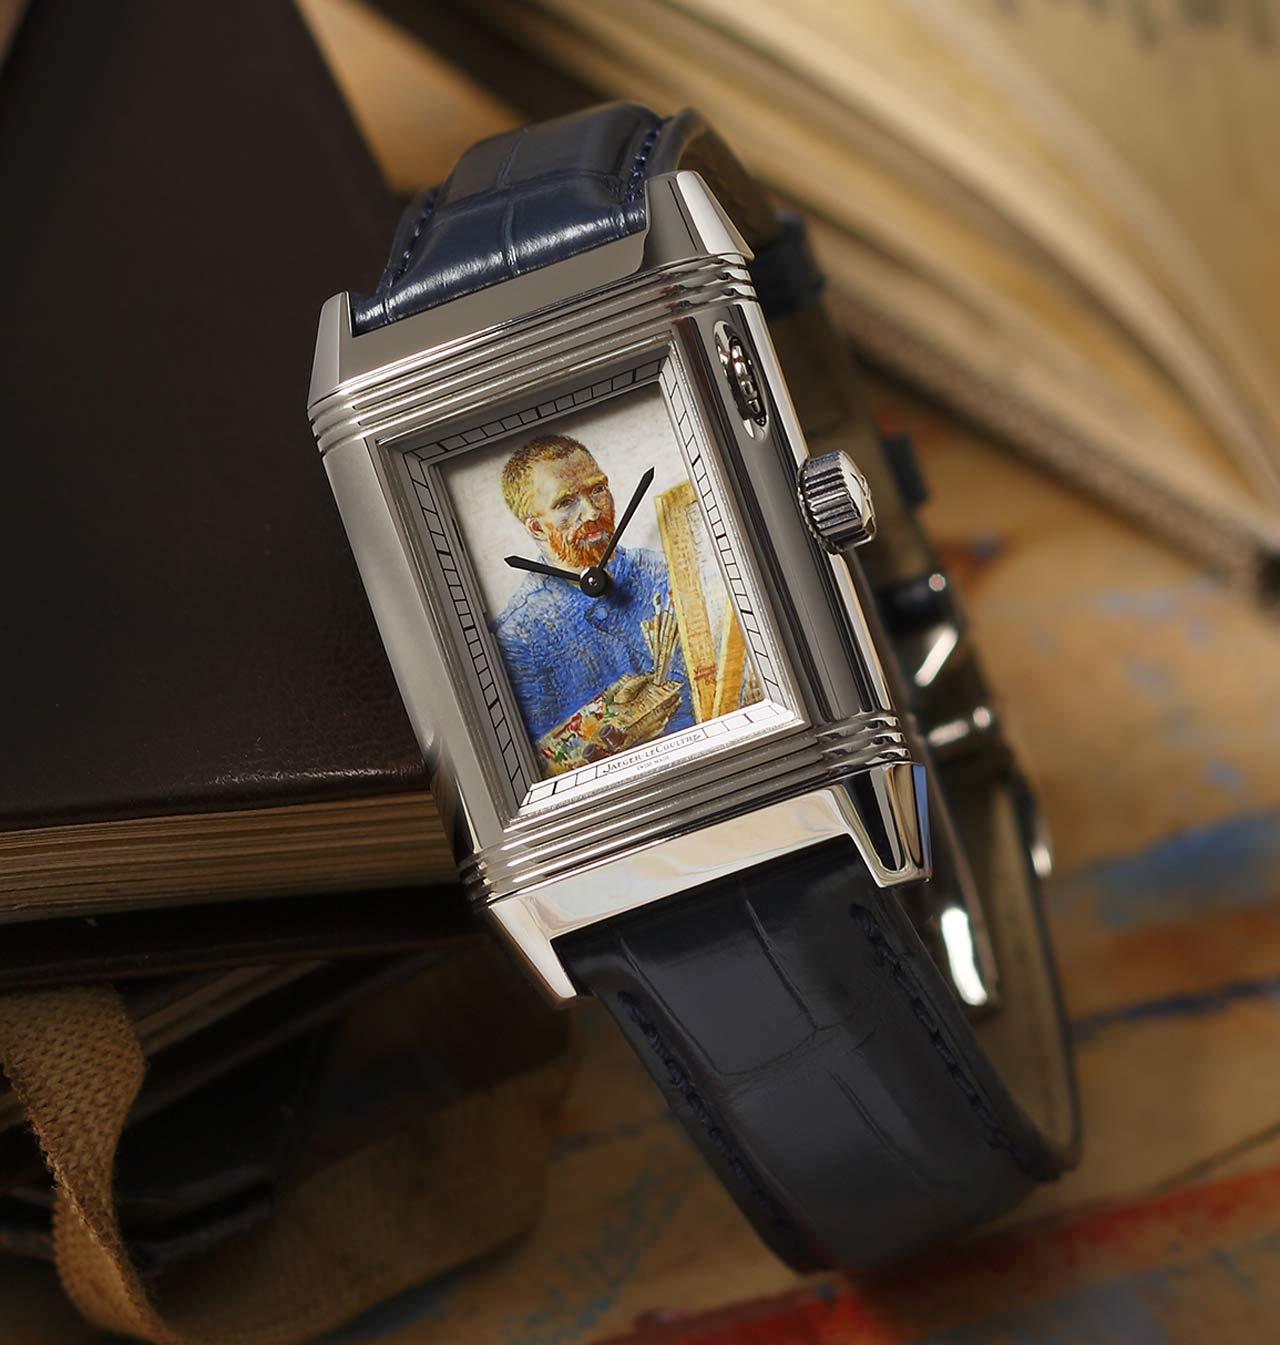 Reverso à Eclipse Homenaje a Van Gogh, más que un reloj, una auténtica obra de arte